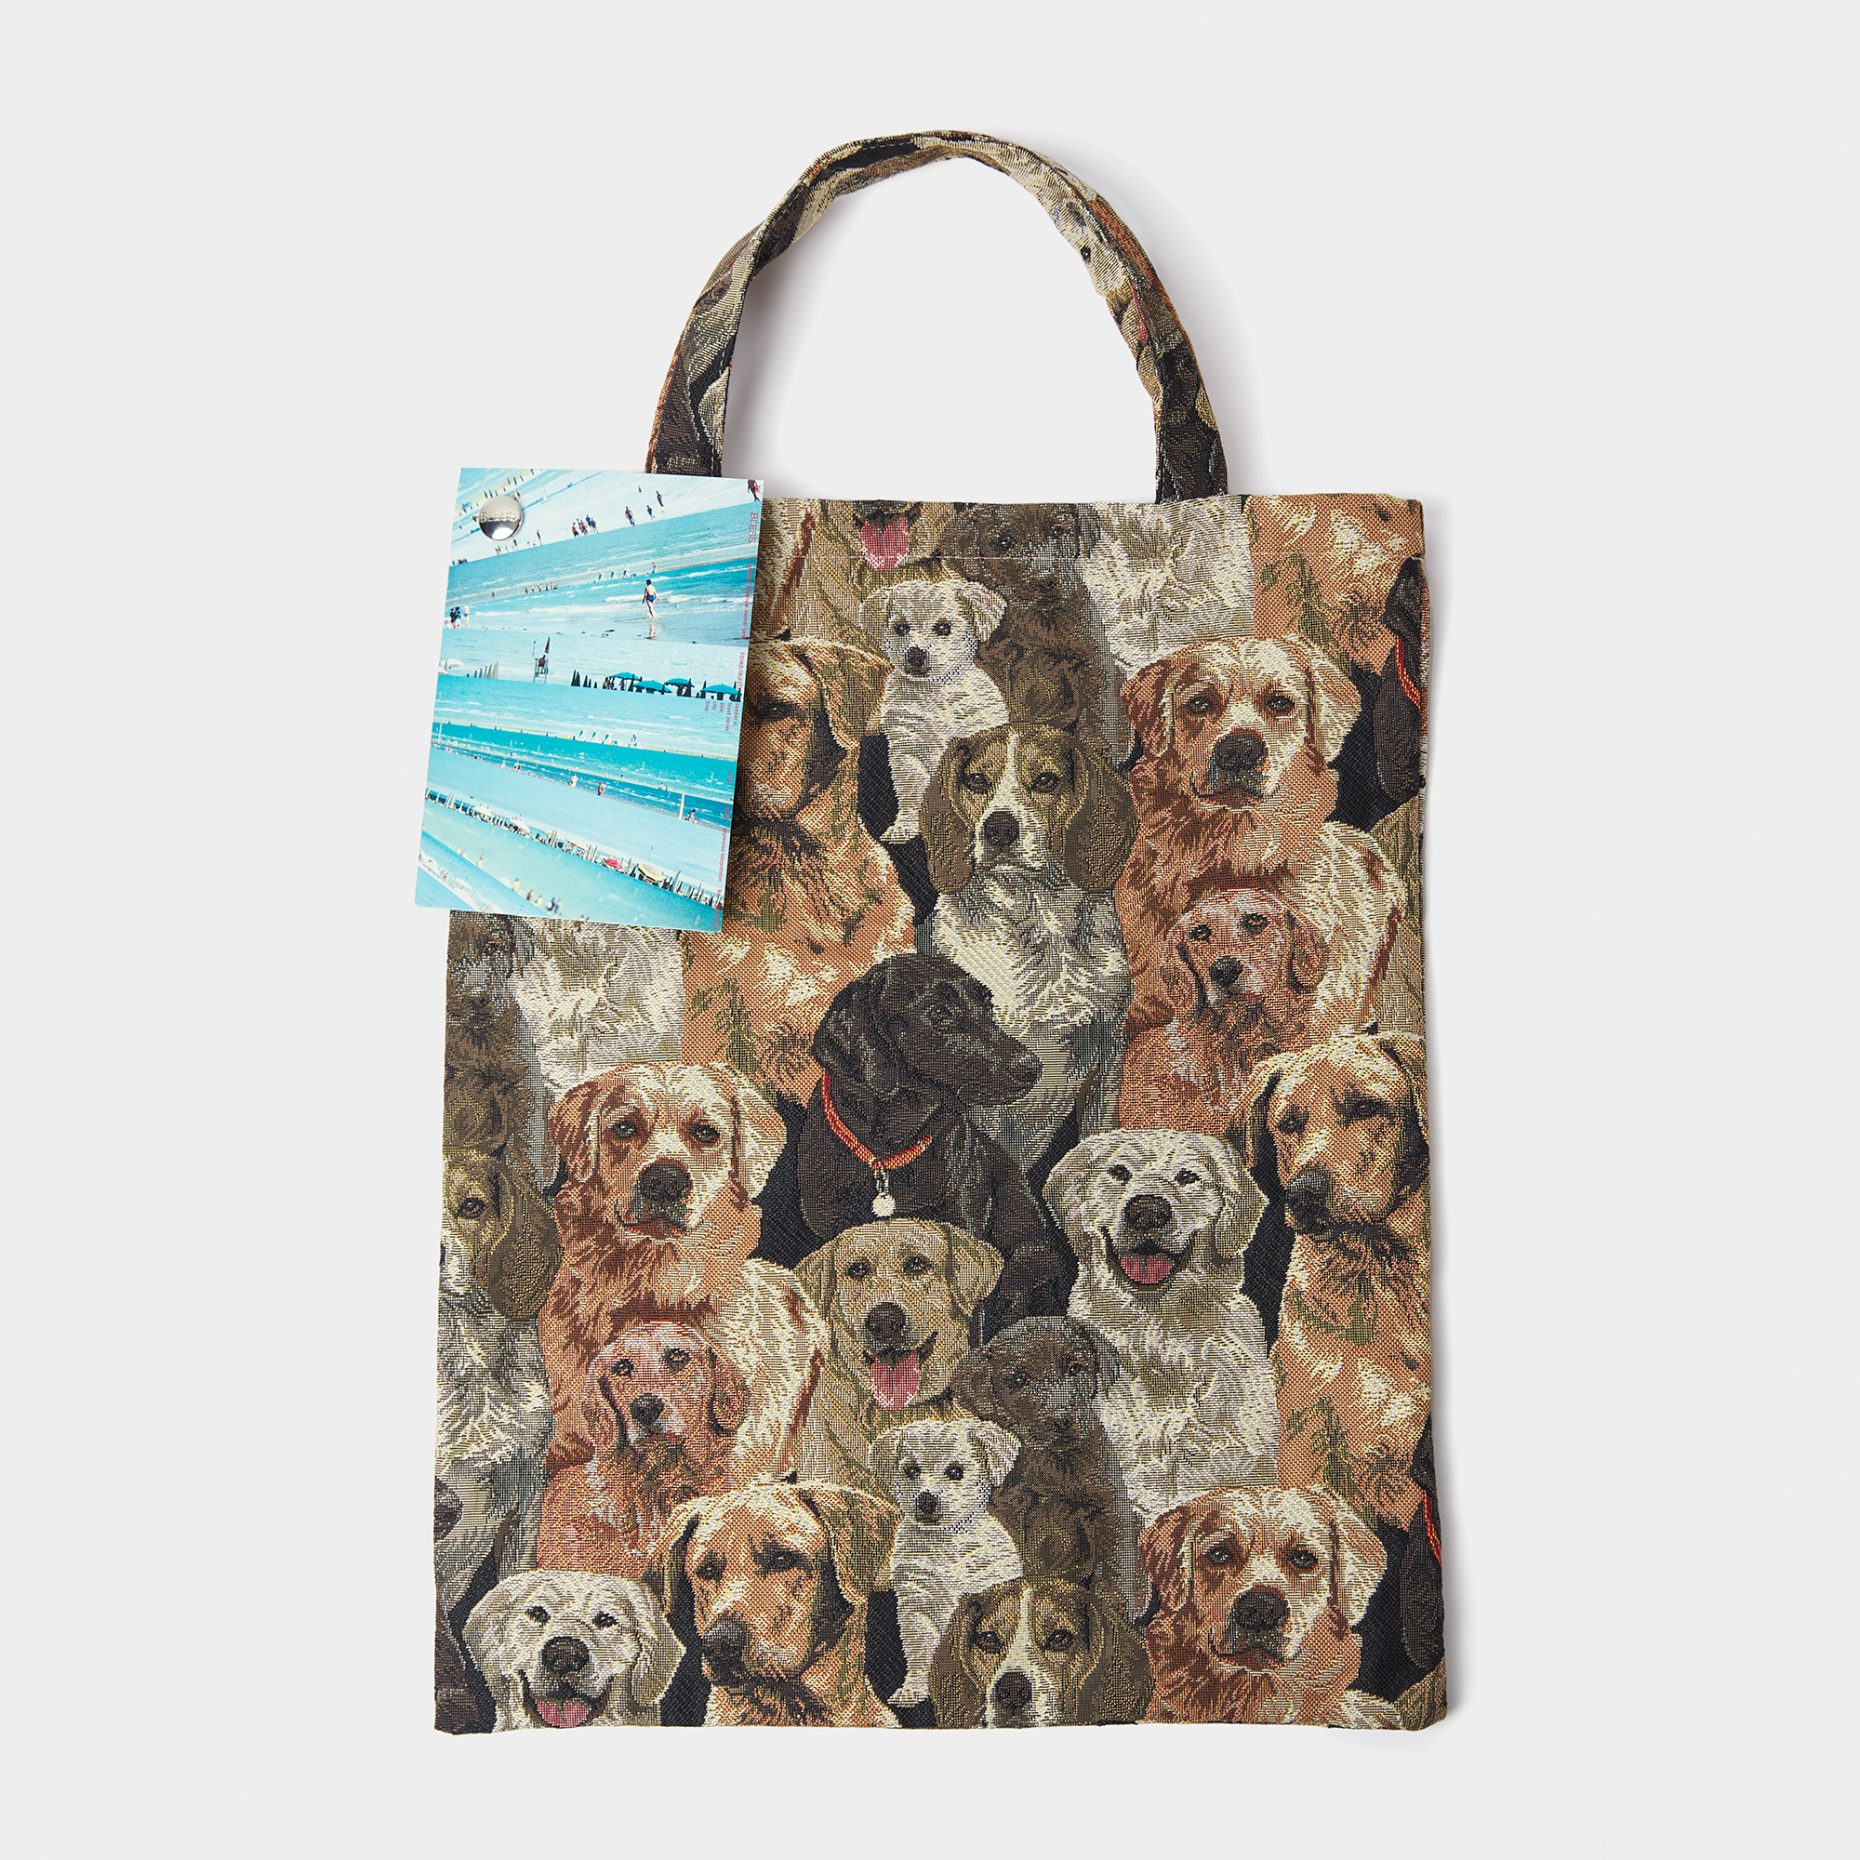 Bless Dog Bag Big